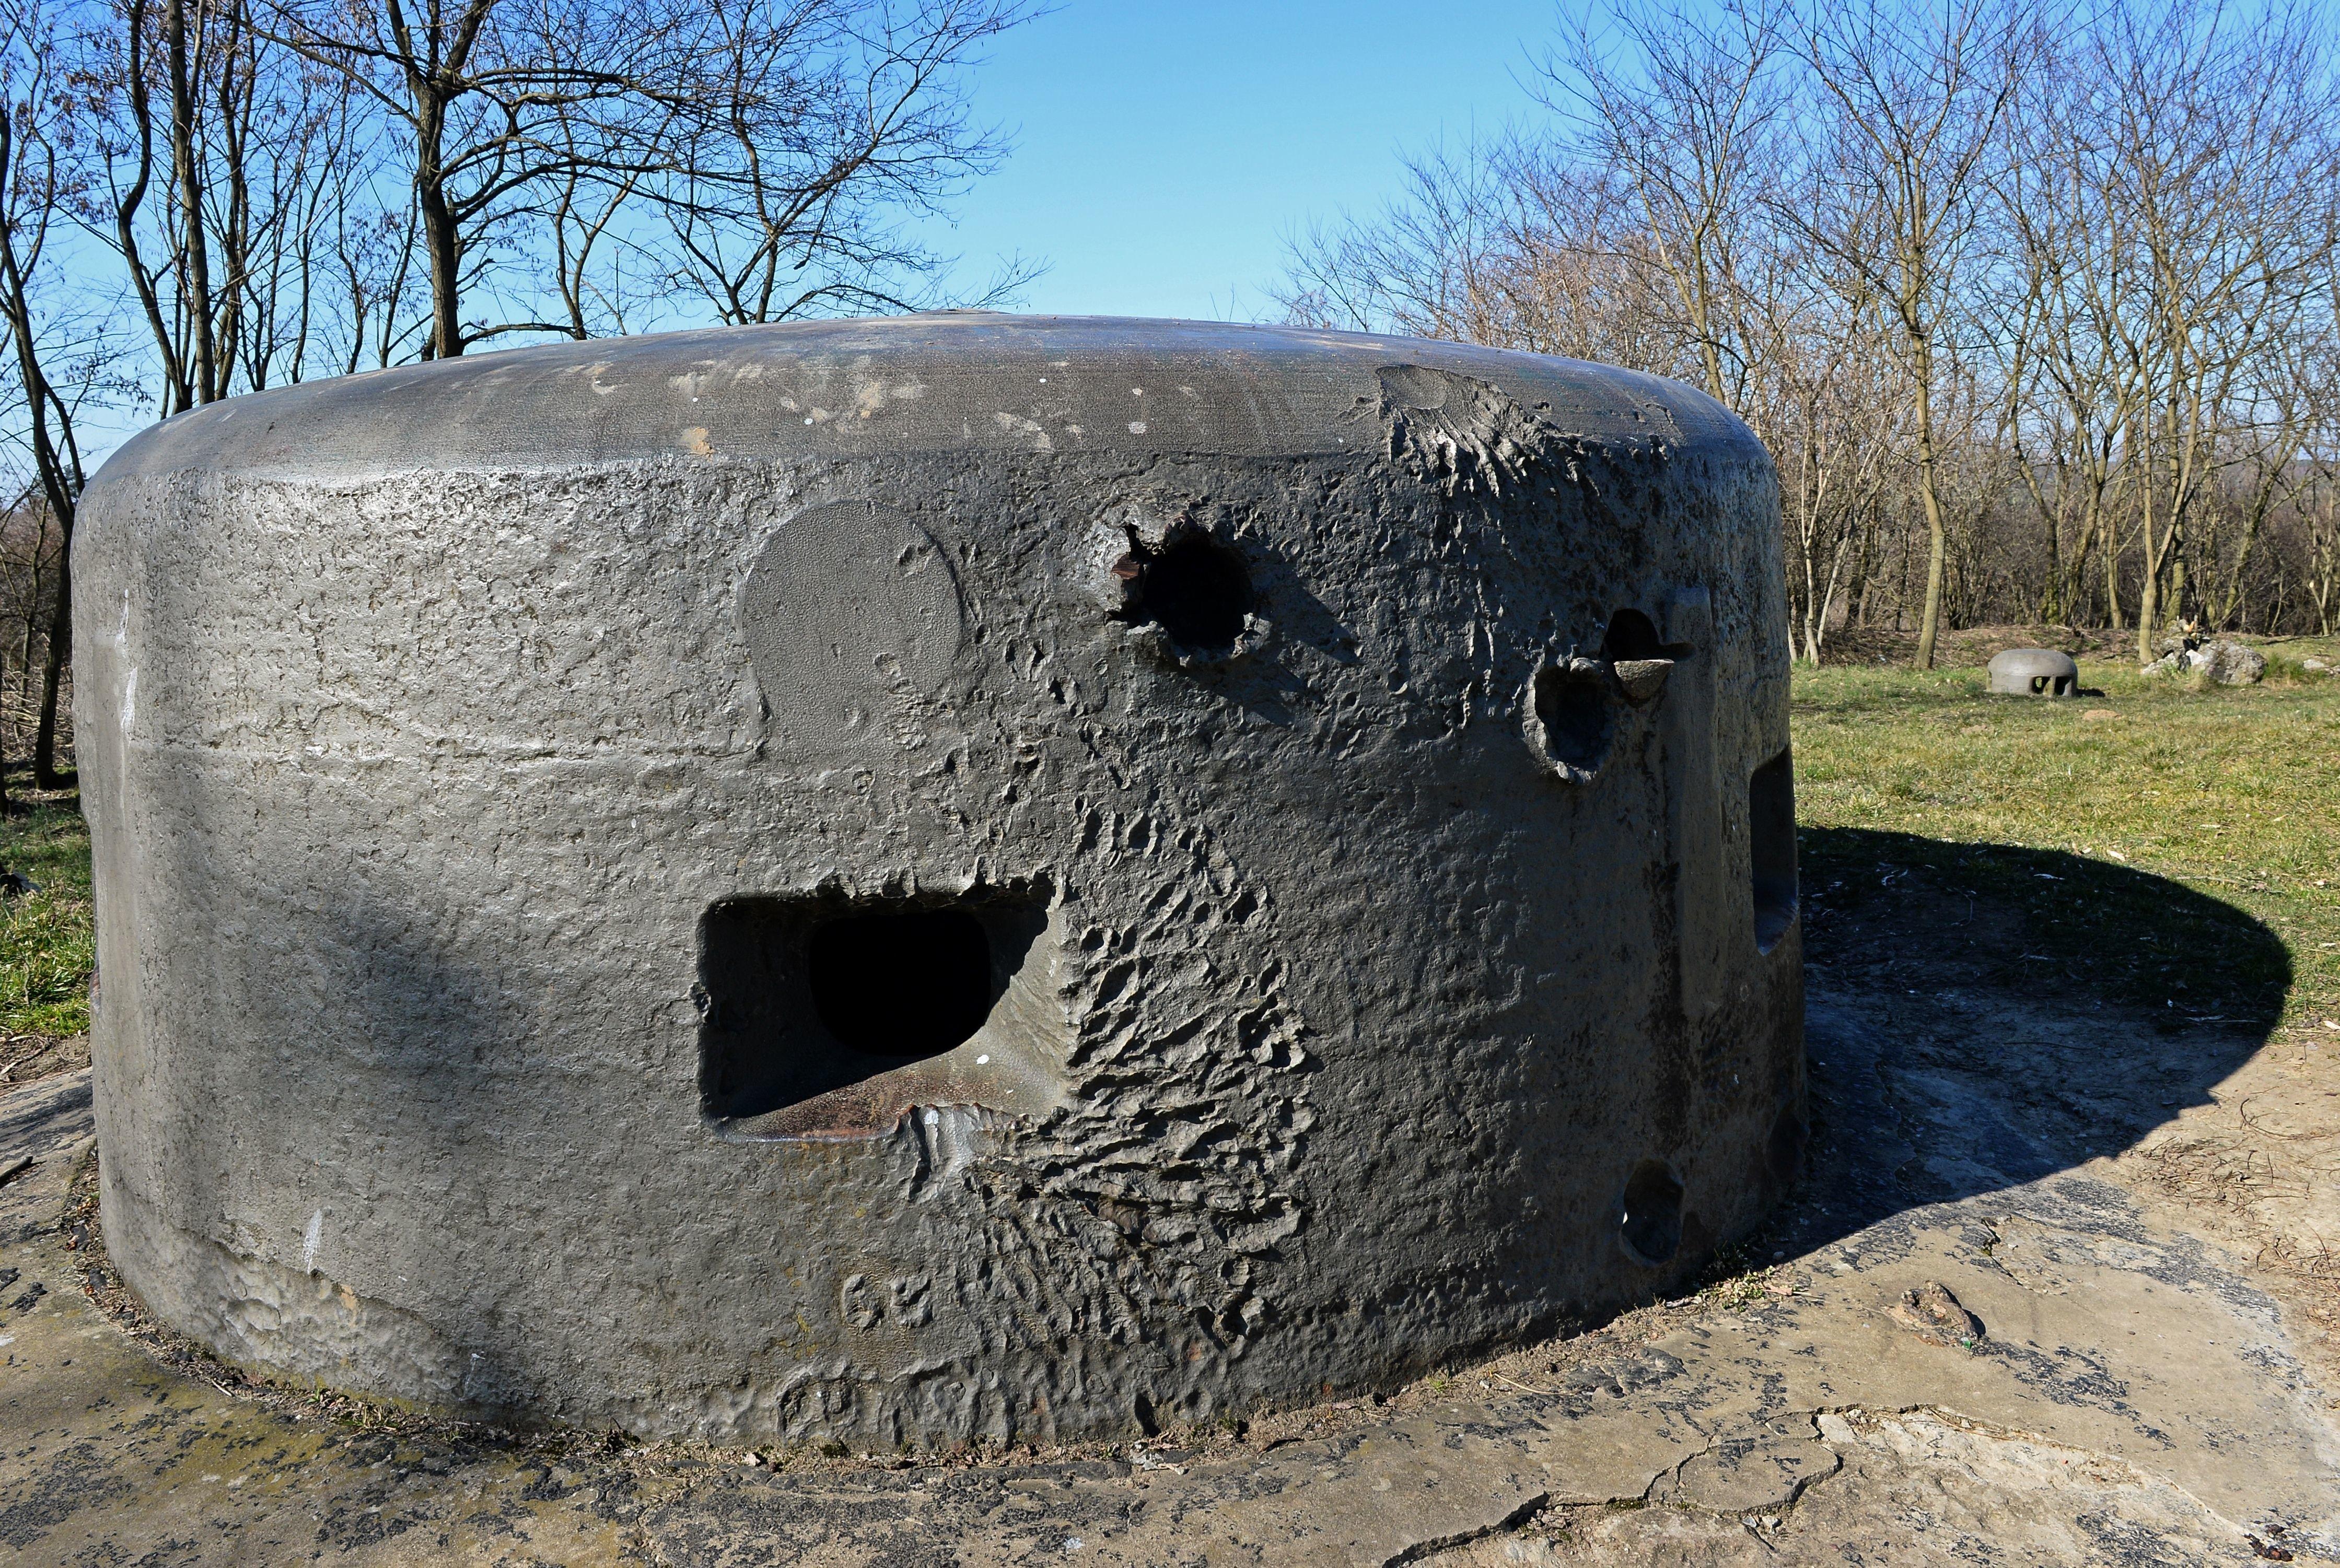 «Regenwurmlager»: Μια υπόγεια «πολιτεία» των Ναζί στην εξοχή της